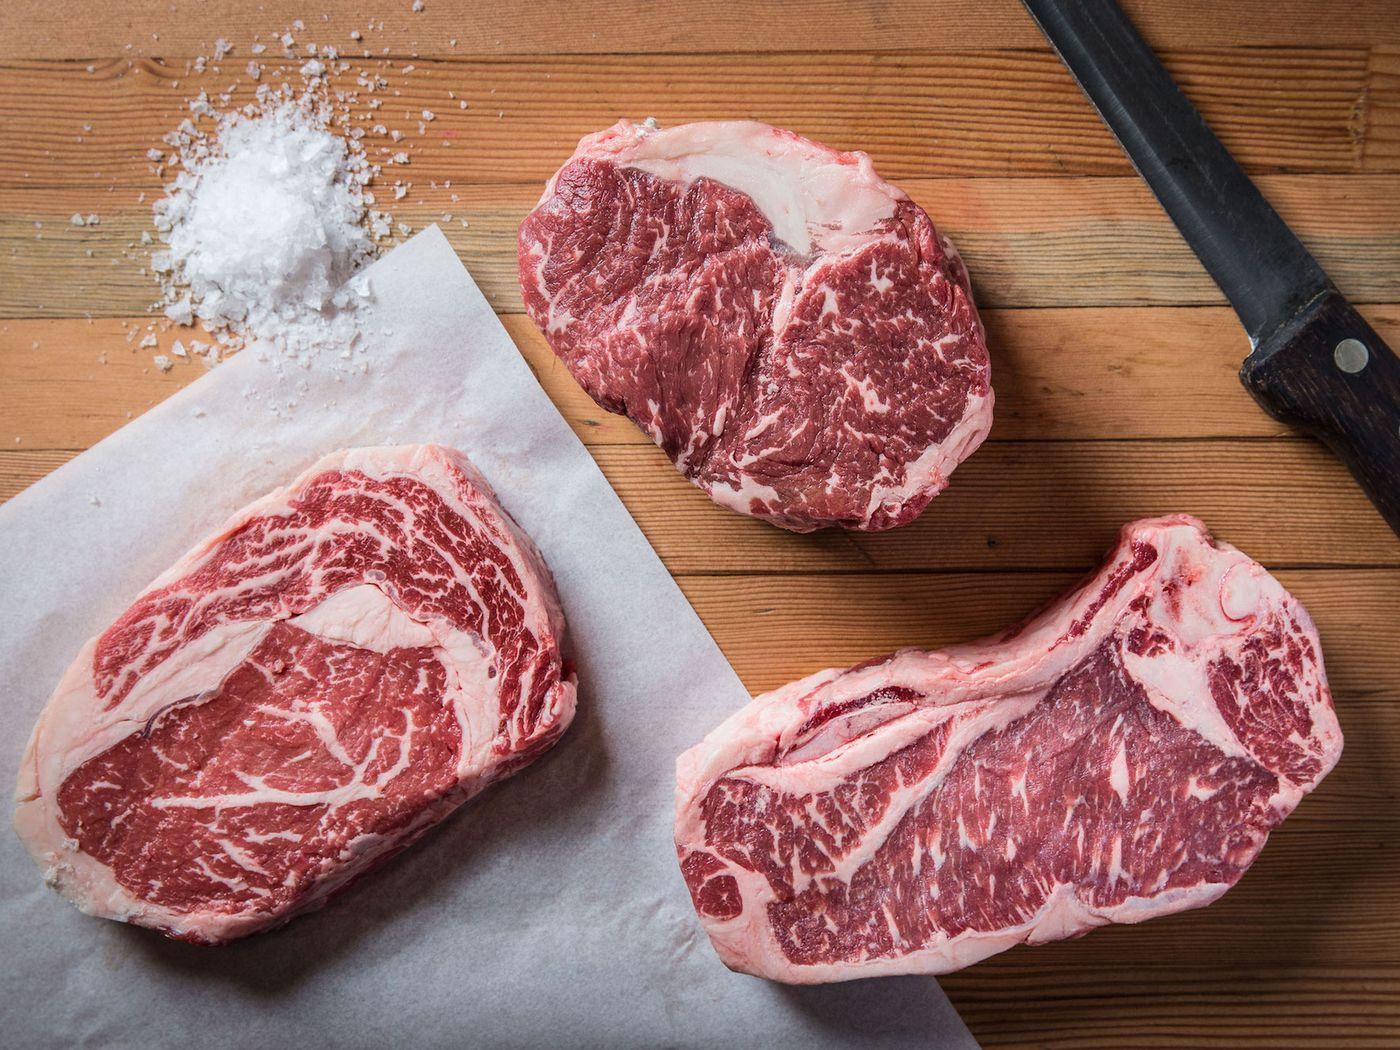 LAs Bourbon Steak Does Massive New 96 Ounce Cut as John Candy 1400x1050